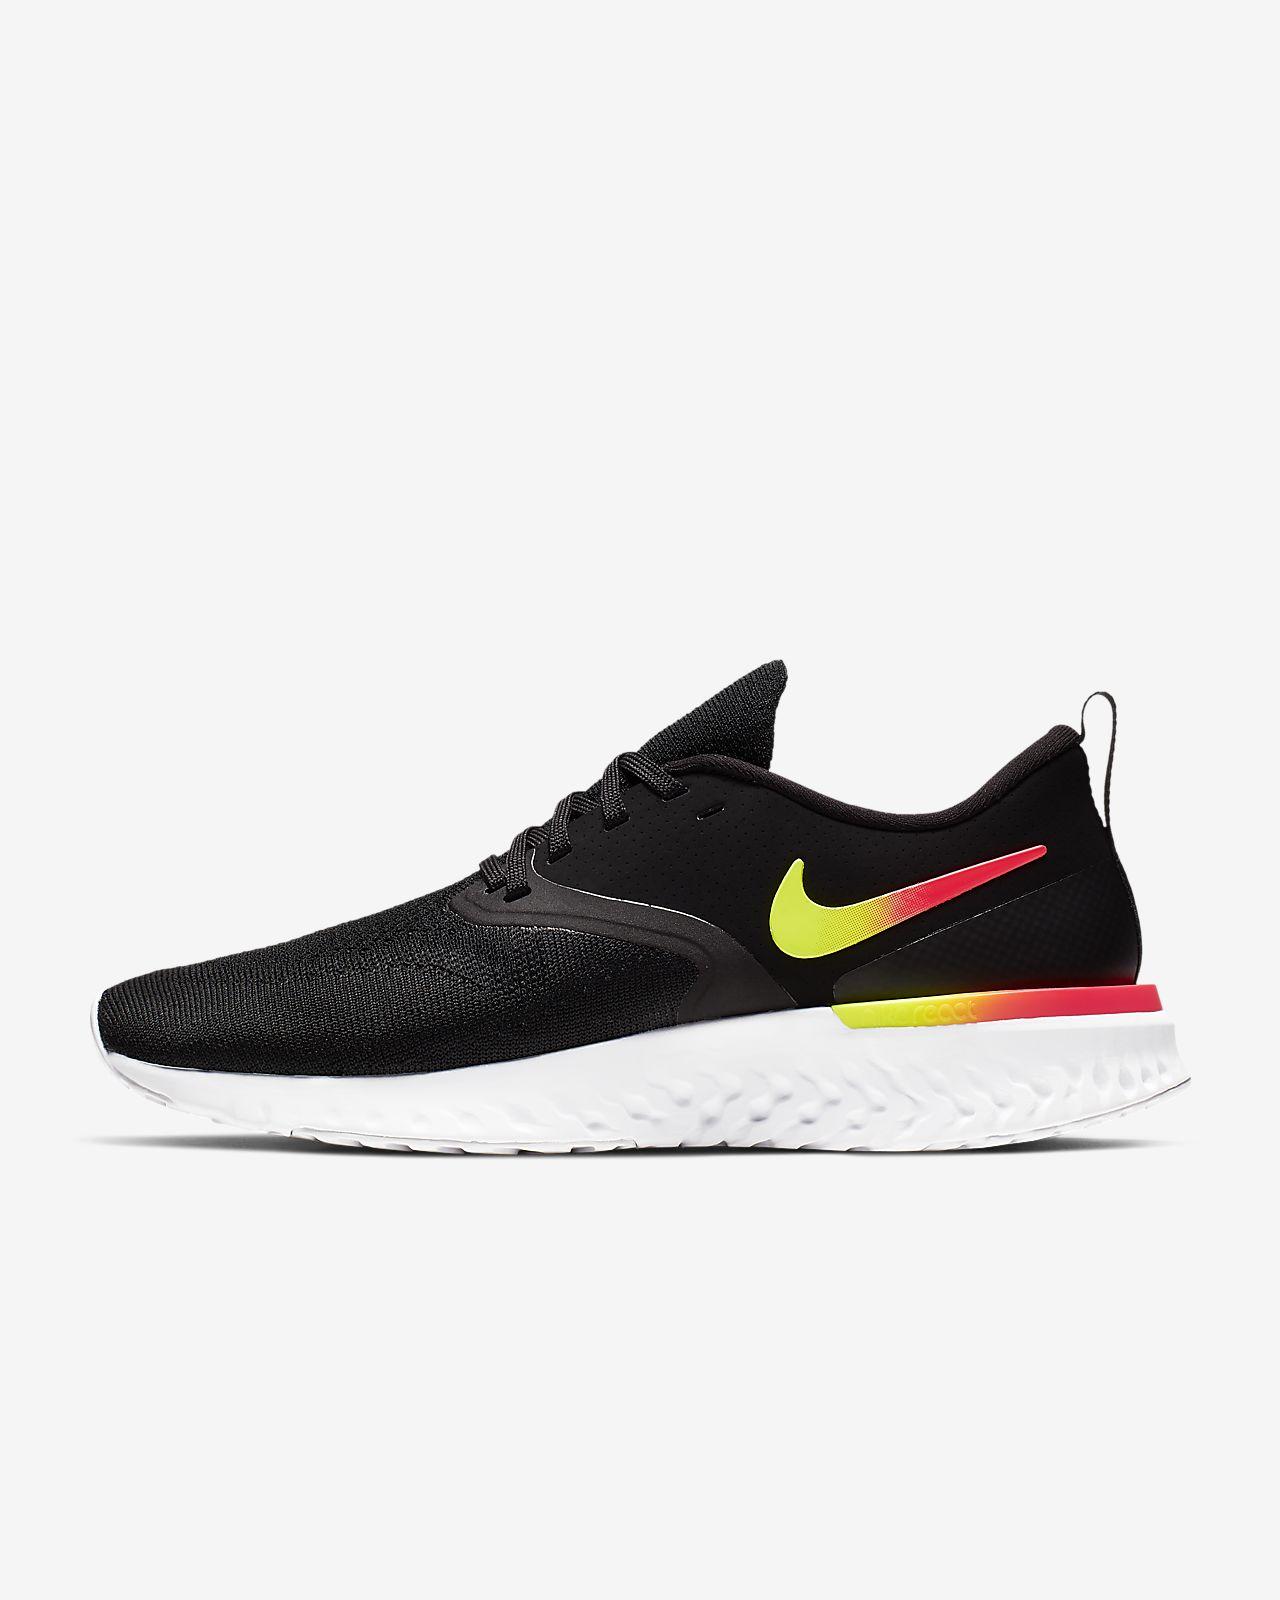 Nike Air Max Sequent 2 Til Udsalg | Nike Dame Løbesko Platin